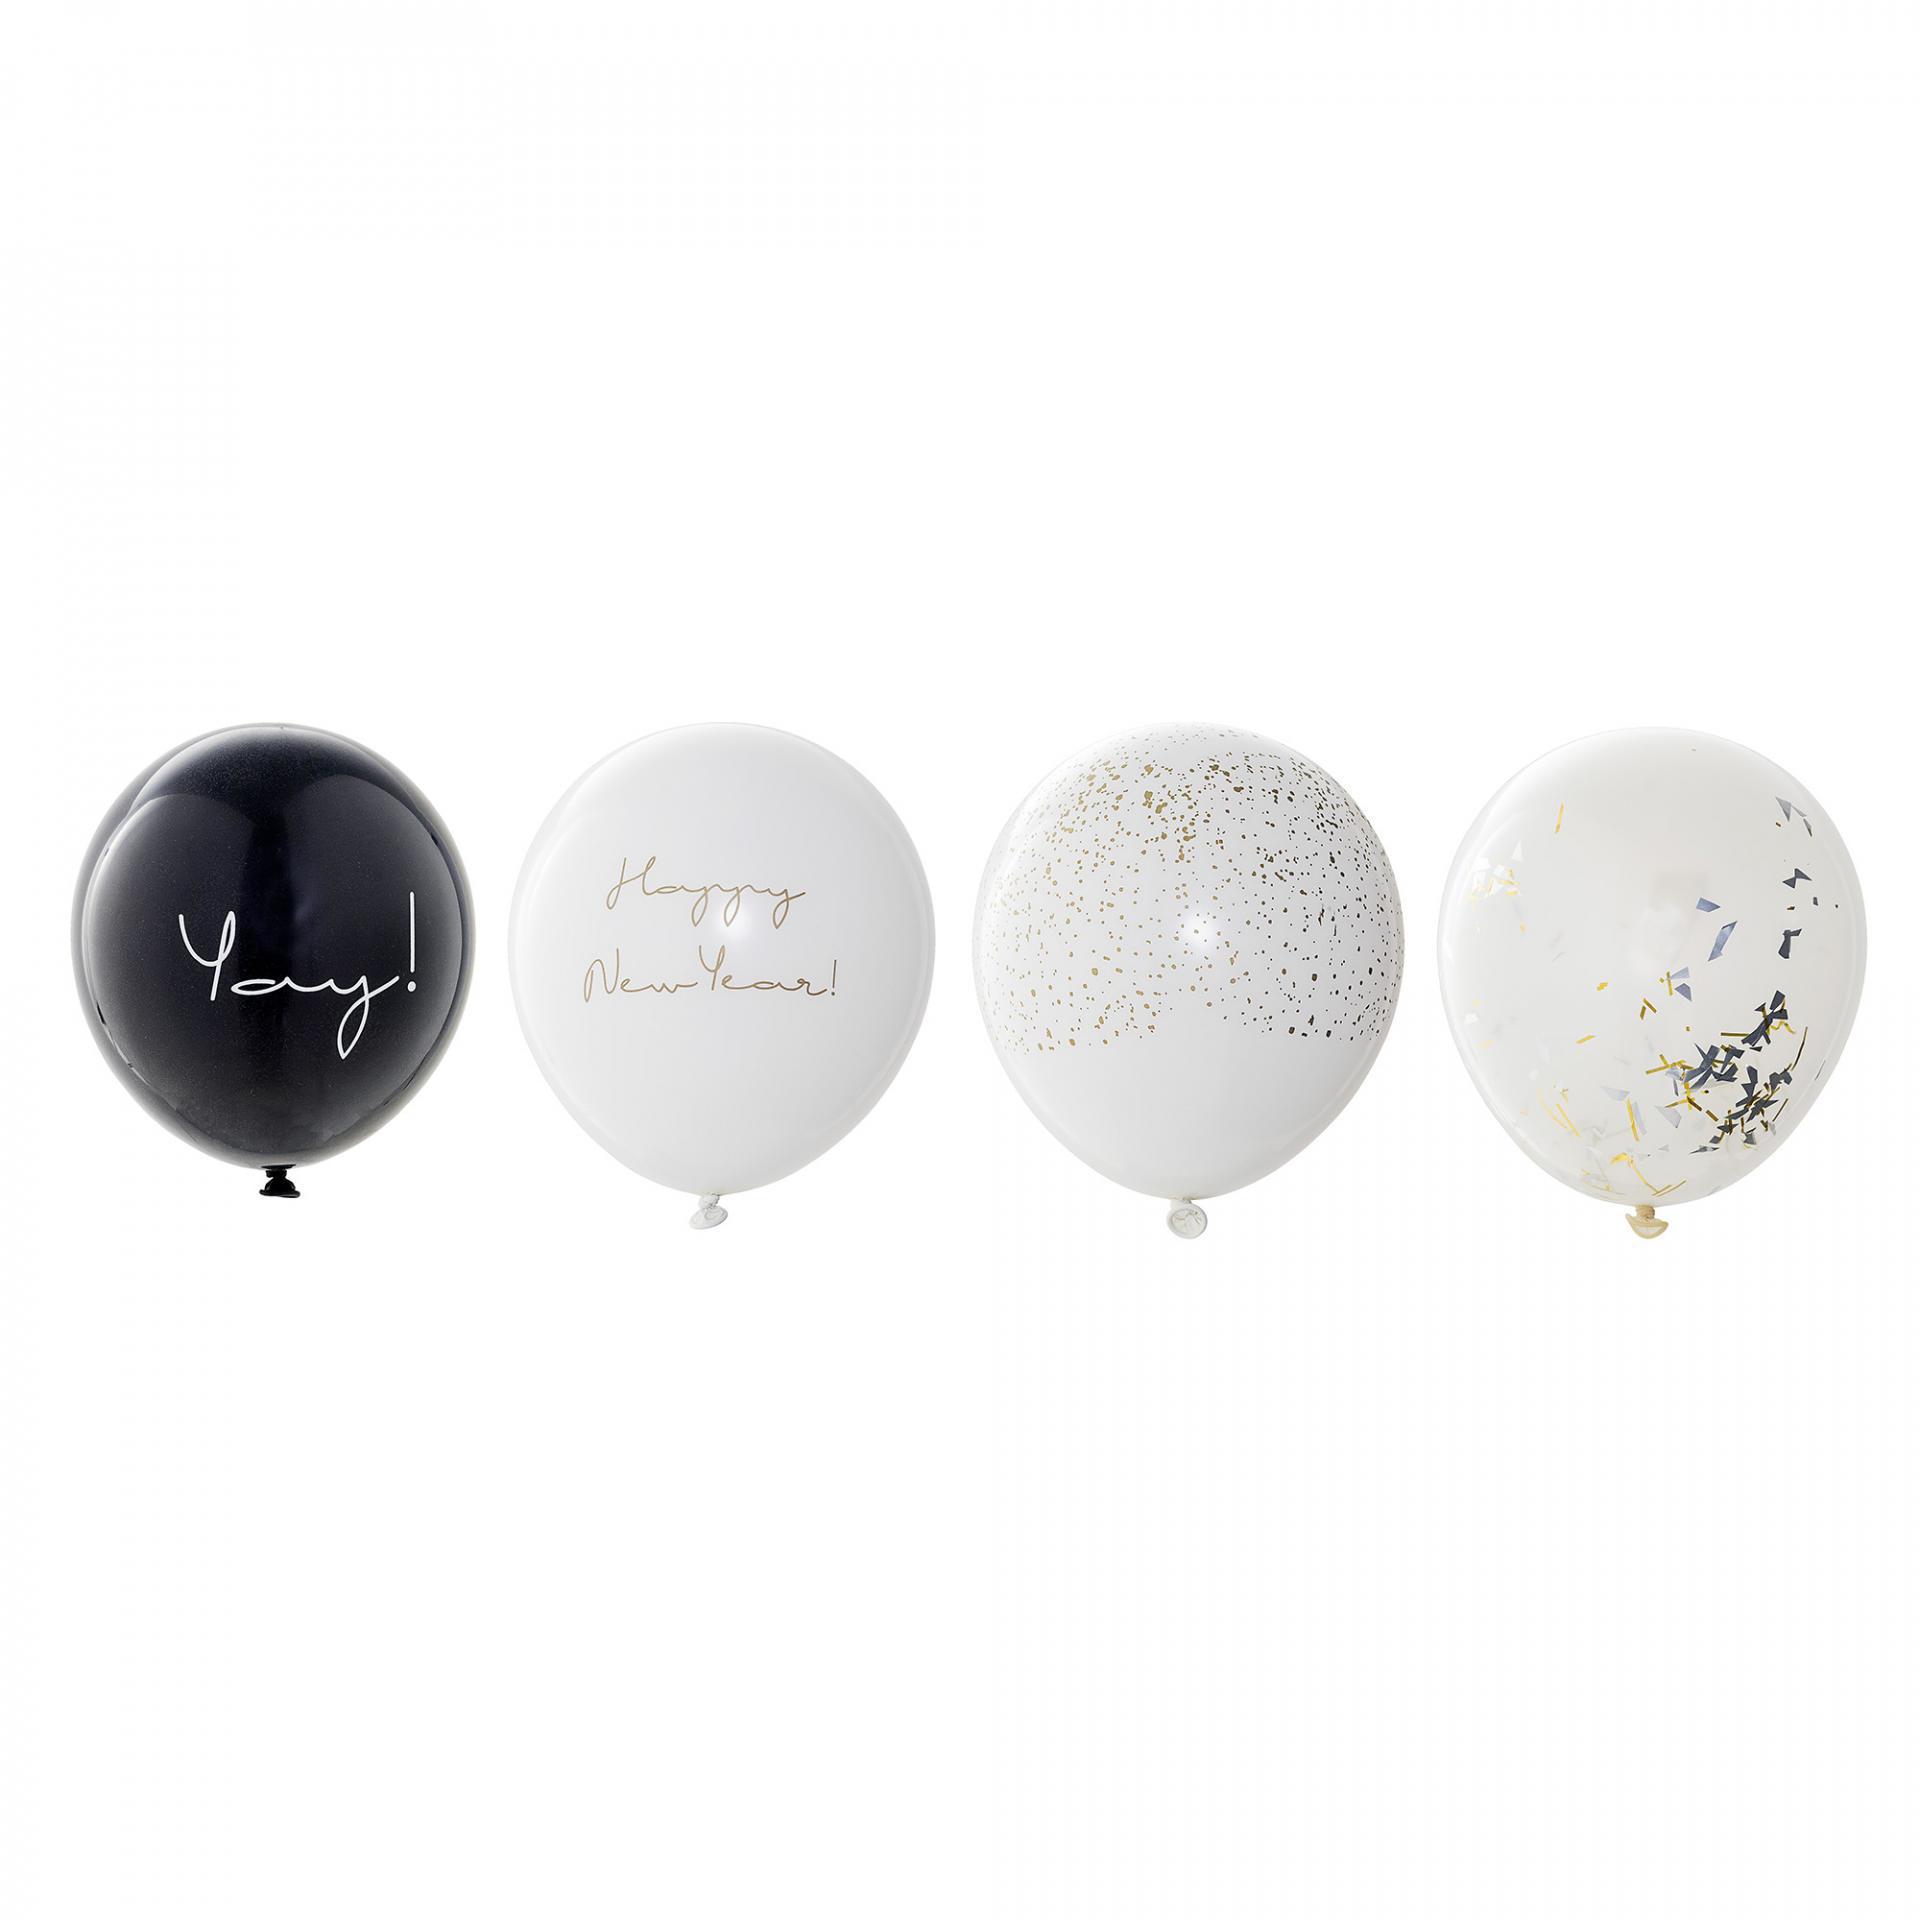 Bloomingville Nafukovací balónky Happy New Year set 24 ks, černá barva, bílá barva, čirá bar